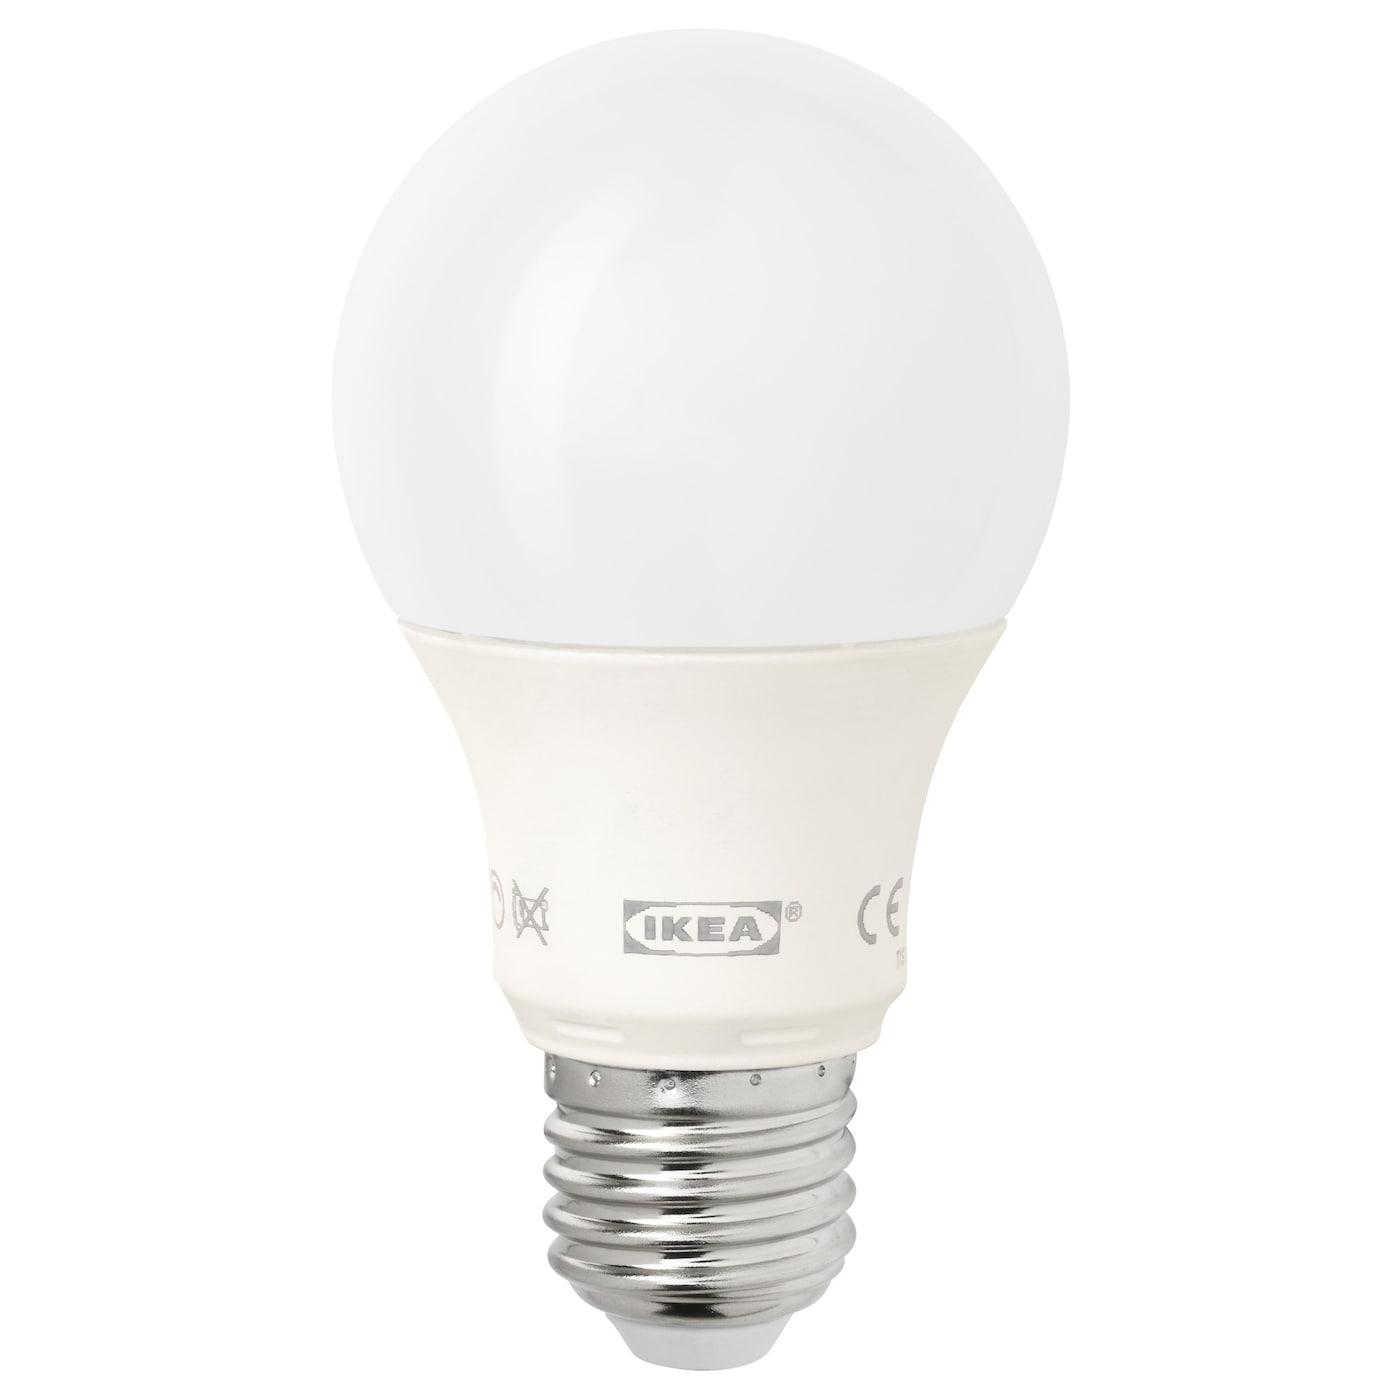 Ledare Led Bulb E27 600 Lumen Dimmable Globe Opal White Ikea